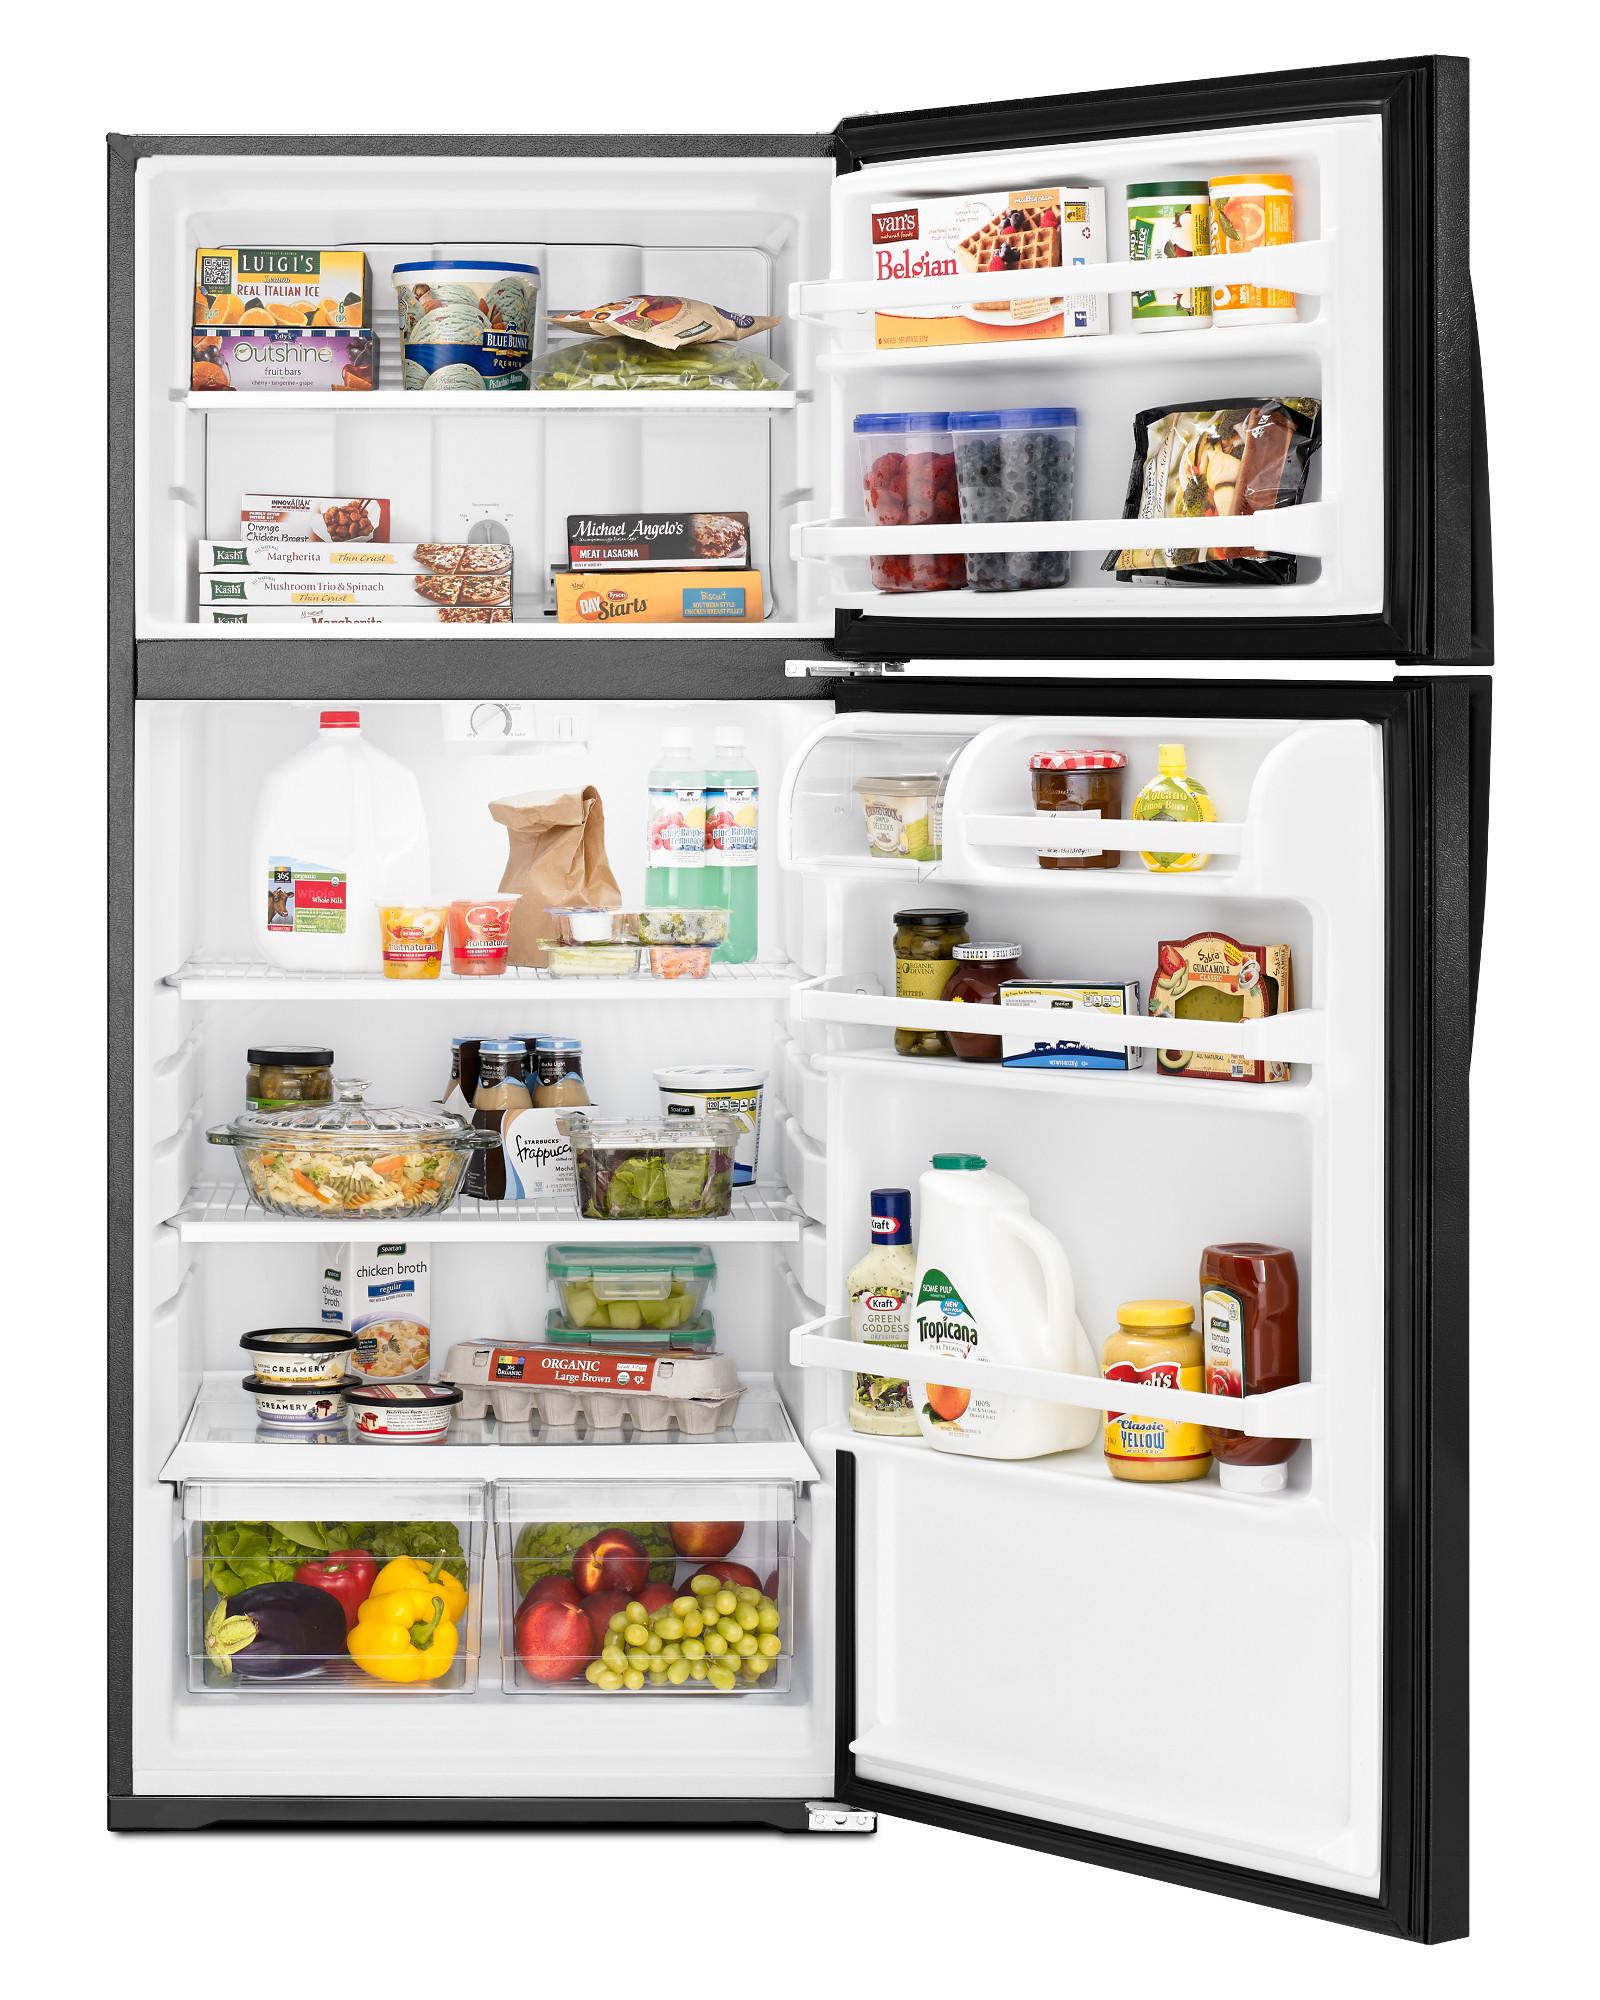 Whirlpool WRT134TFDB 14 cu. ft. Top Freezer Refrigerator - Black